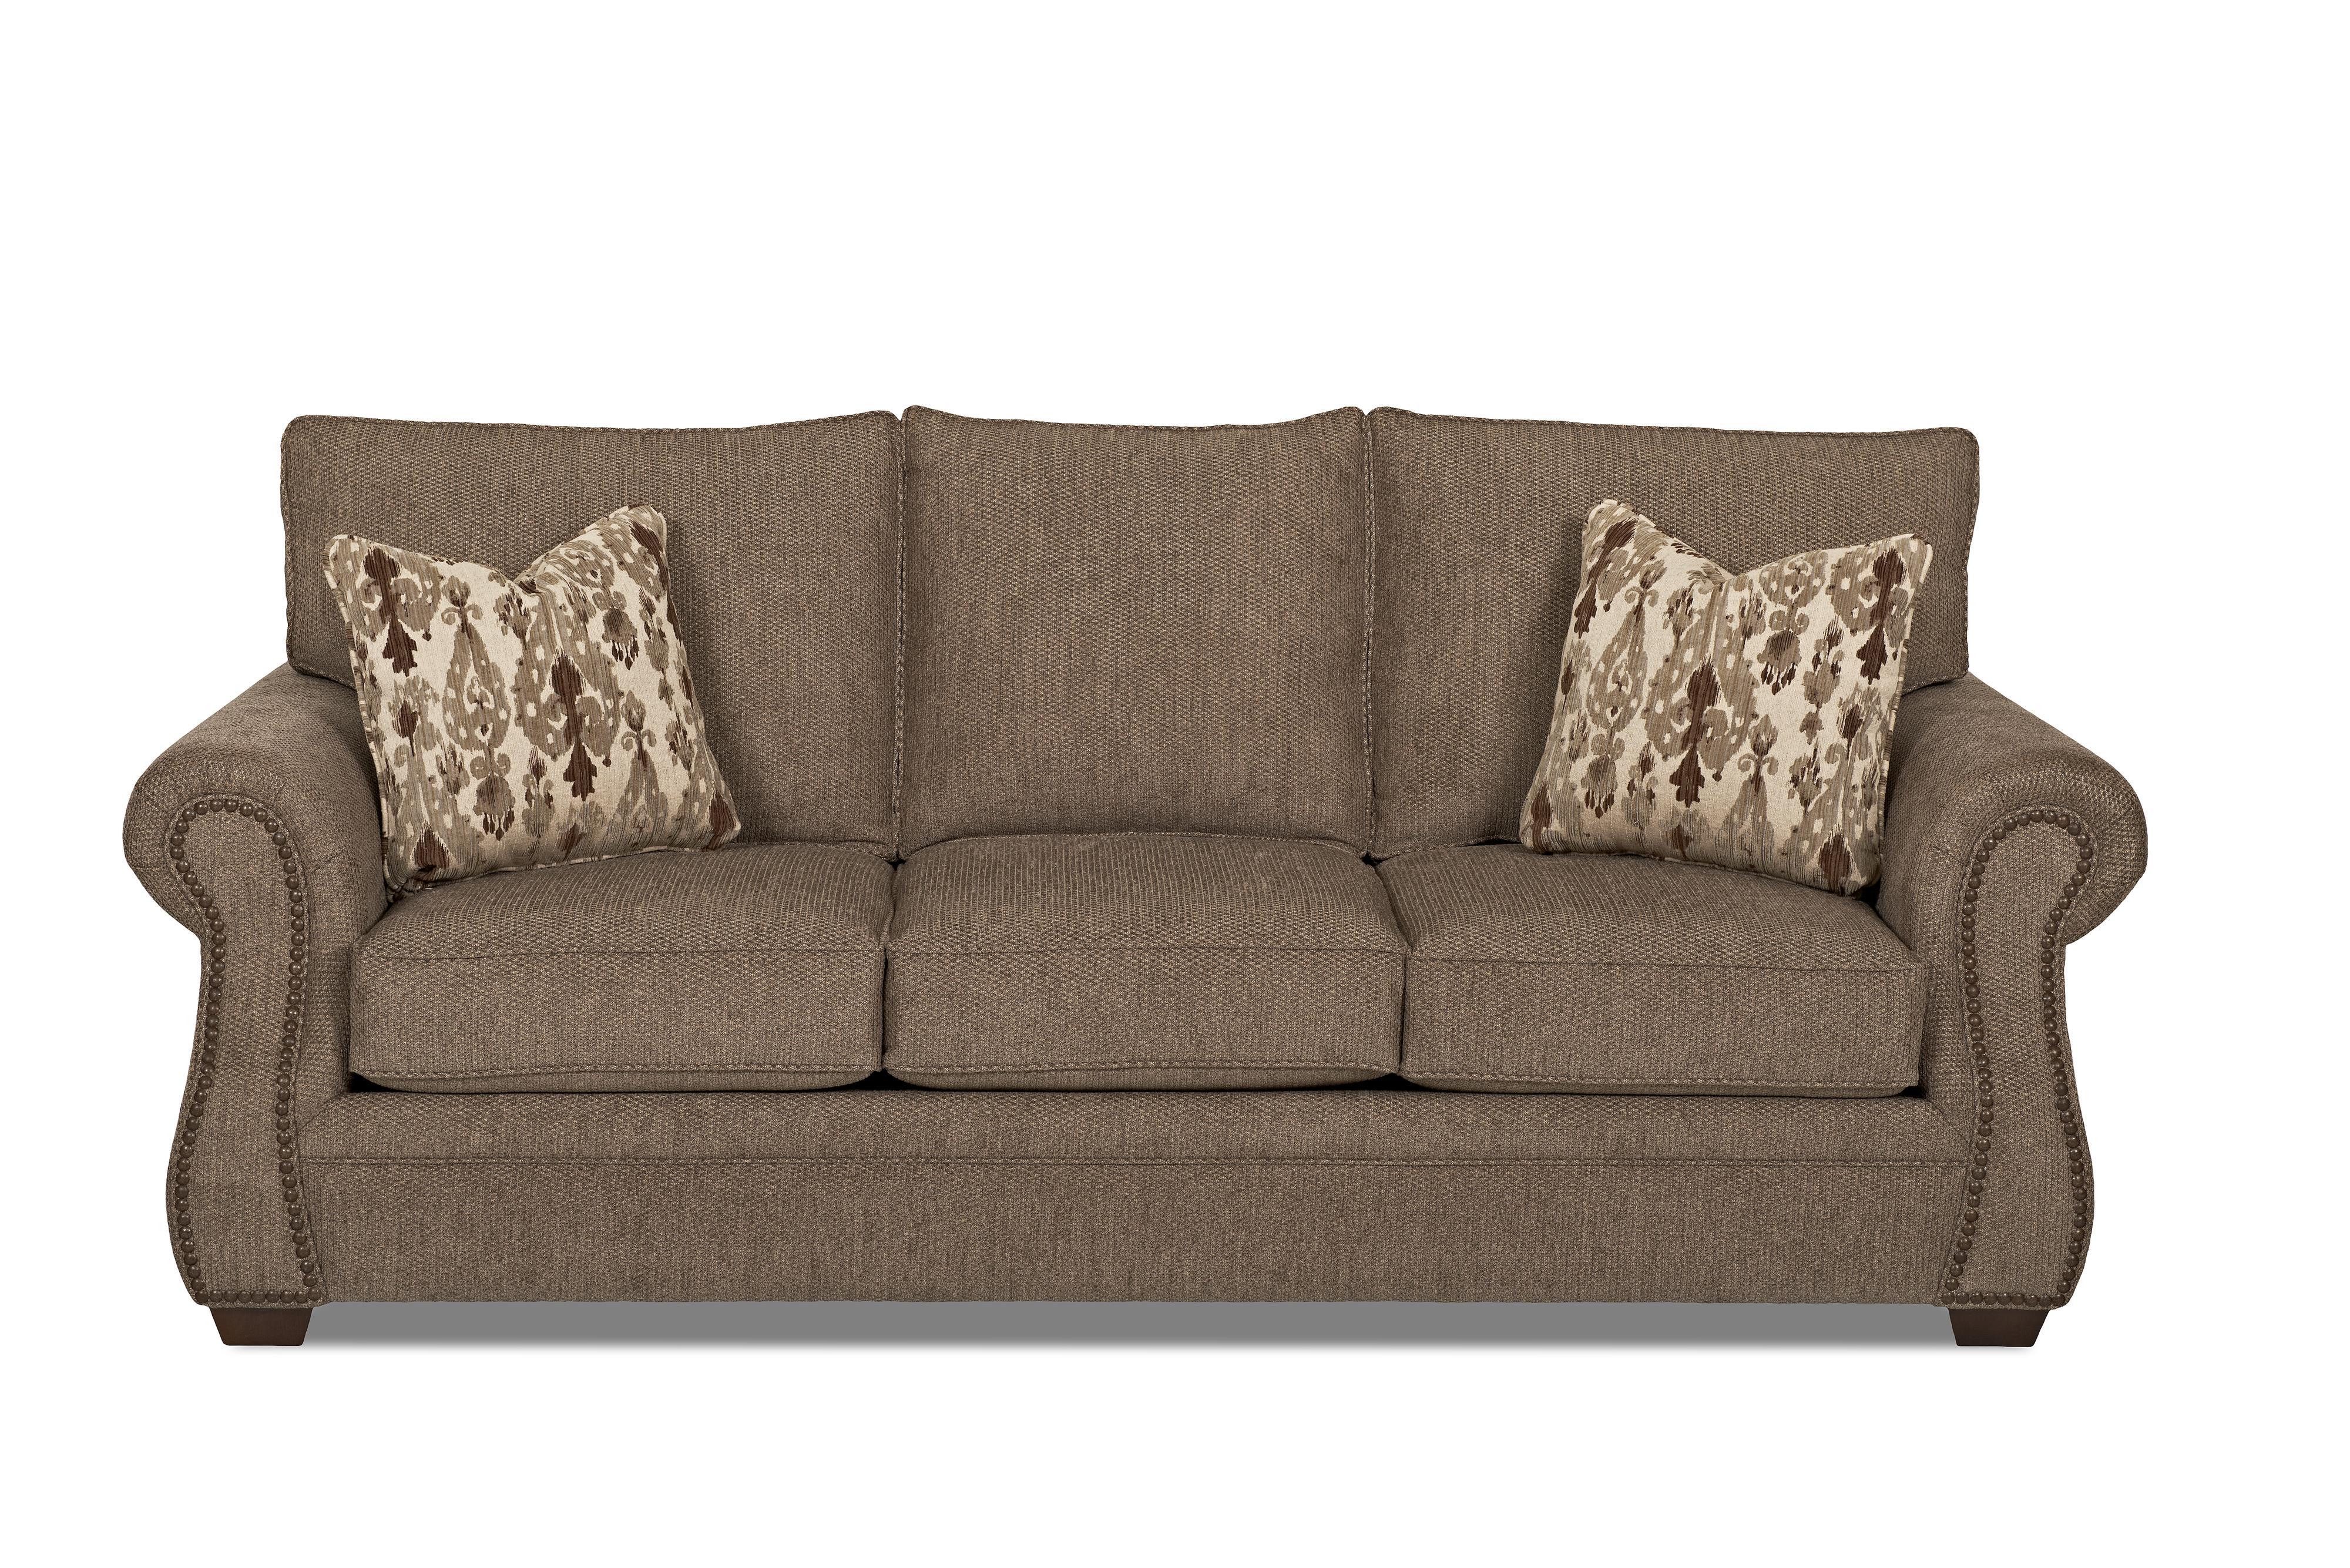 Traditional Enso Memory Foam Queen Sleeper Sofa with Nailhead Trim